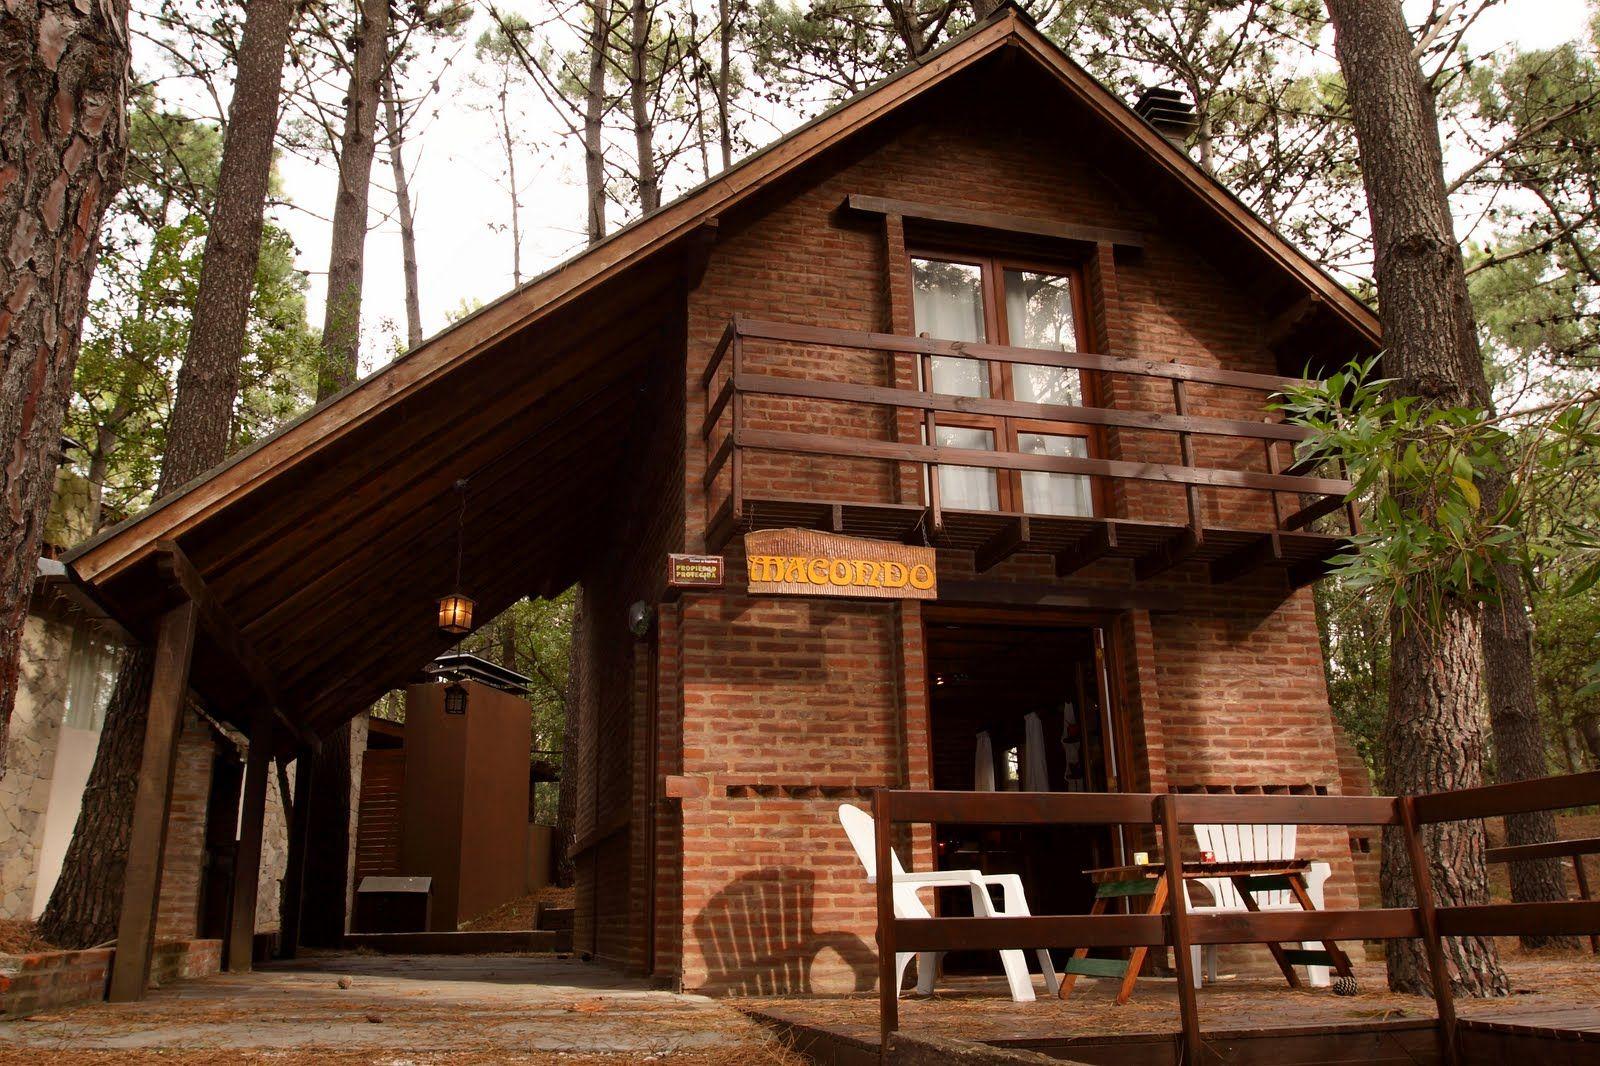 Caba as de madera organiza construcci n casa - Casas rurales de madera ...